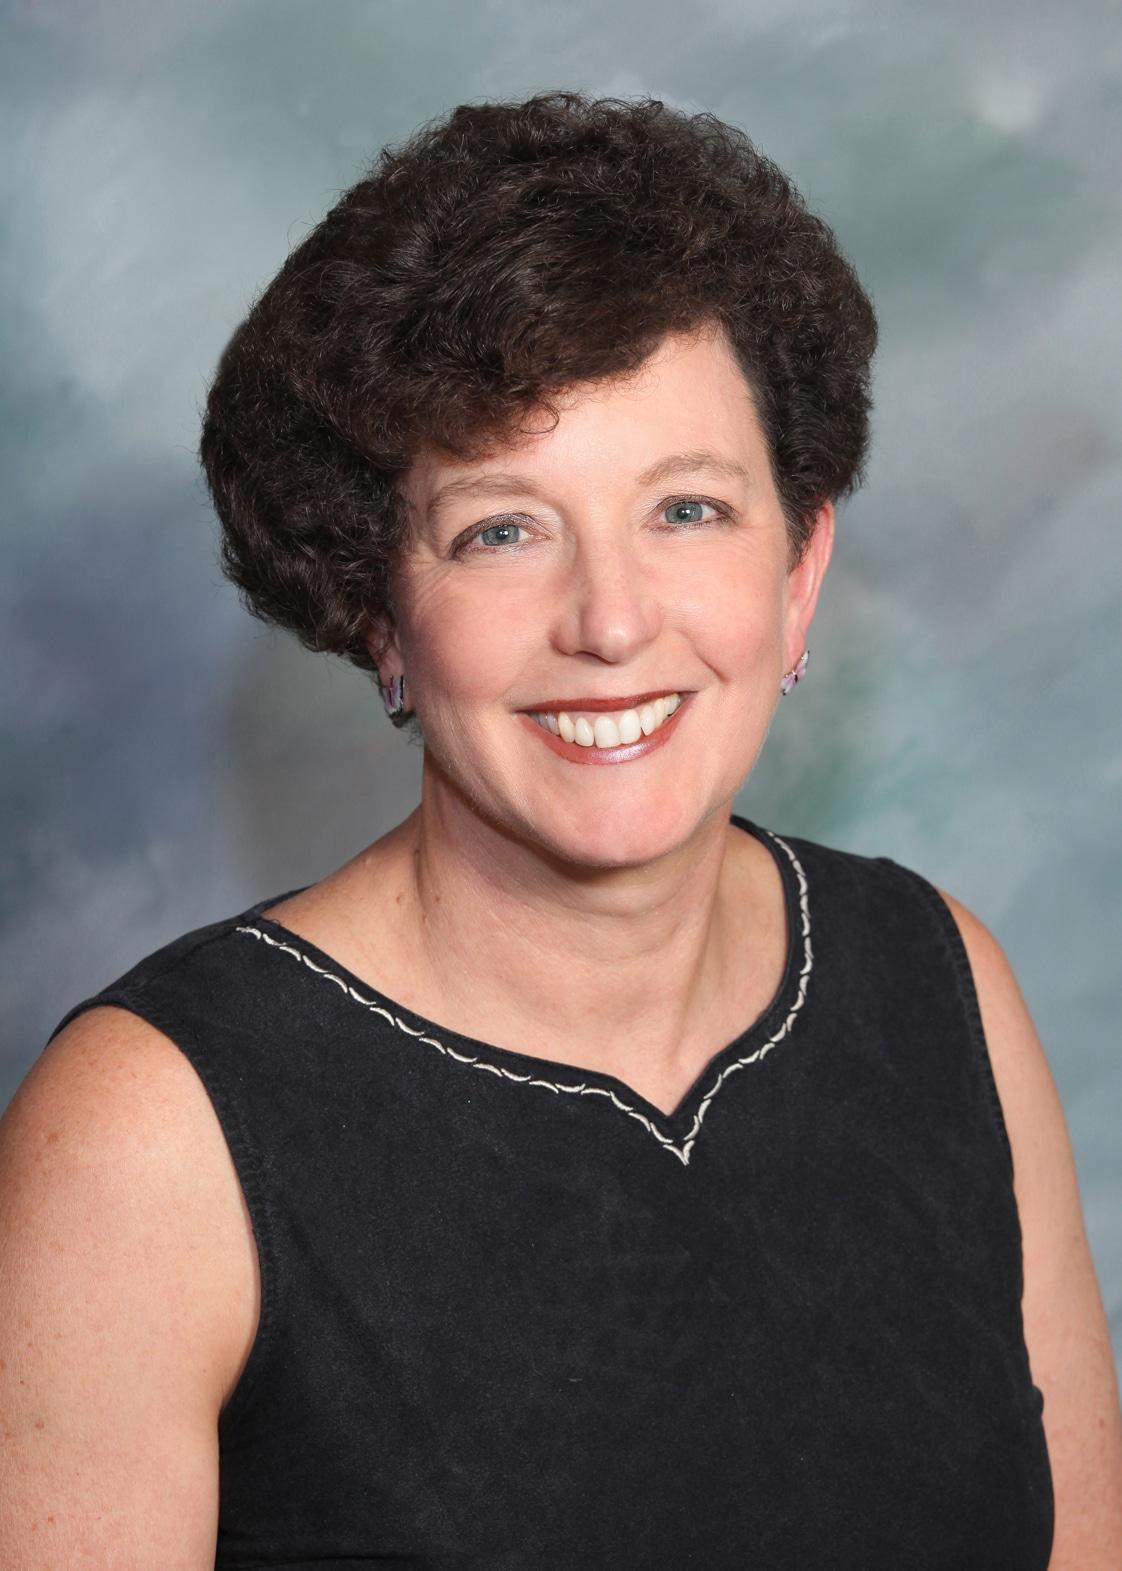 Pam Marrone